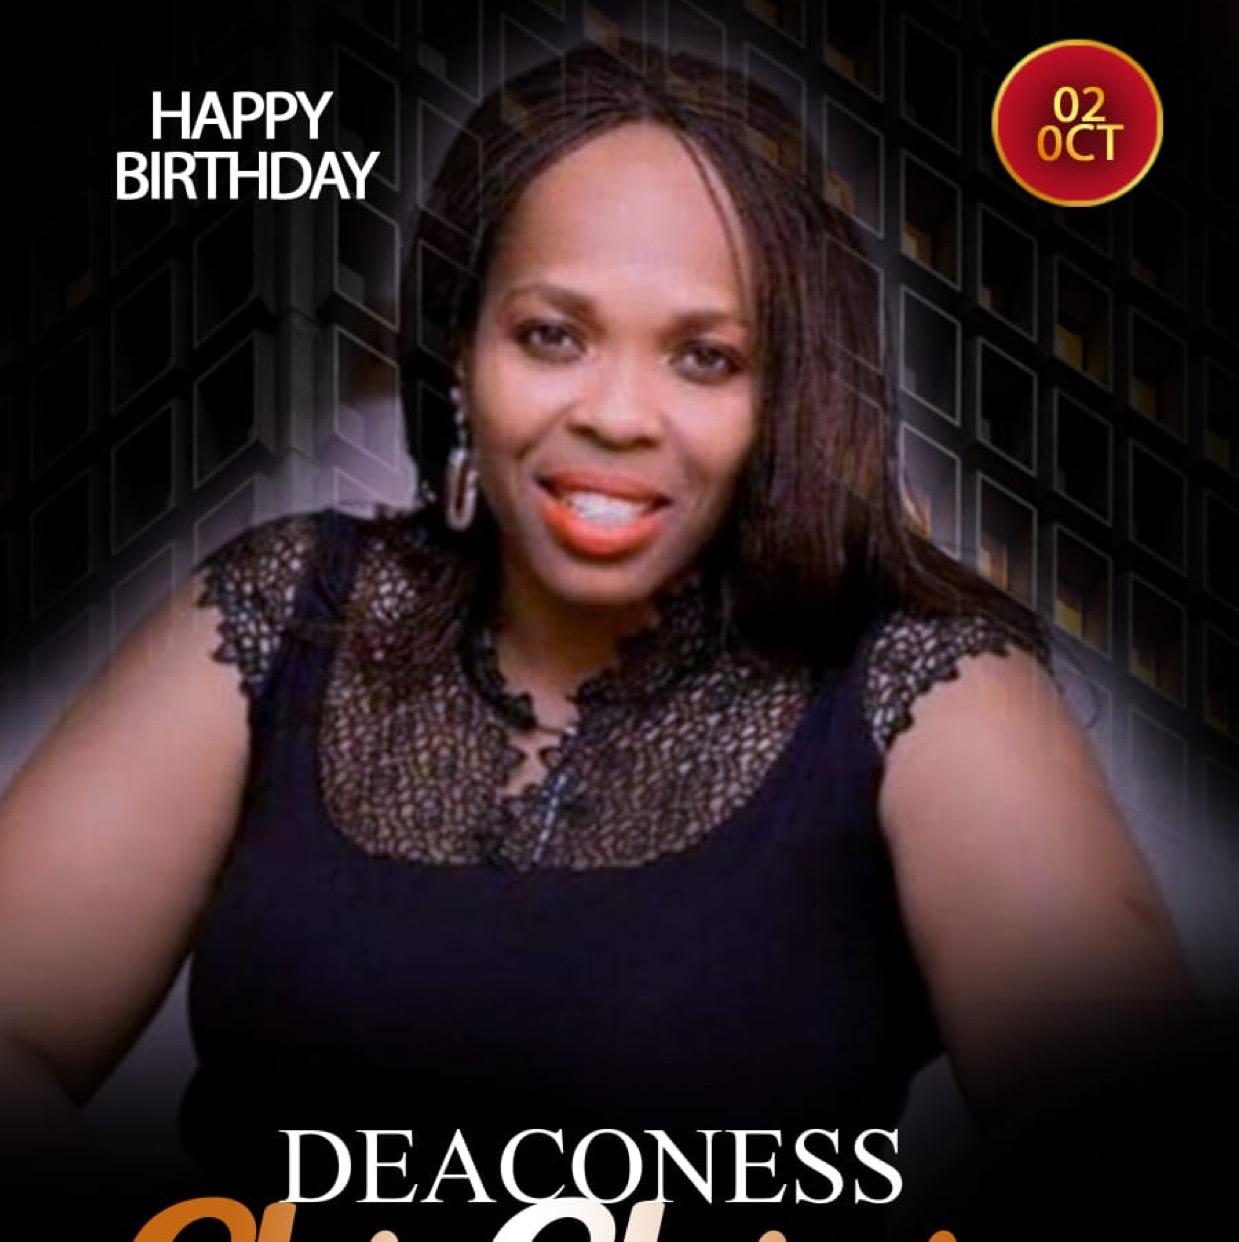 Happy Birthday Dear Dcns Eki.